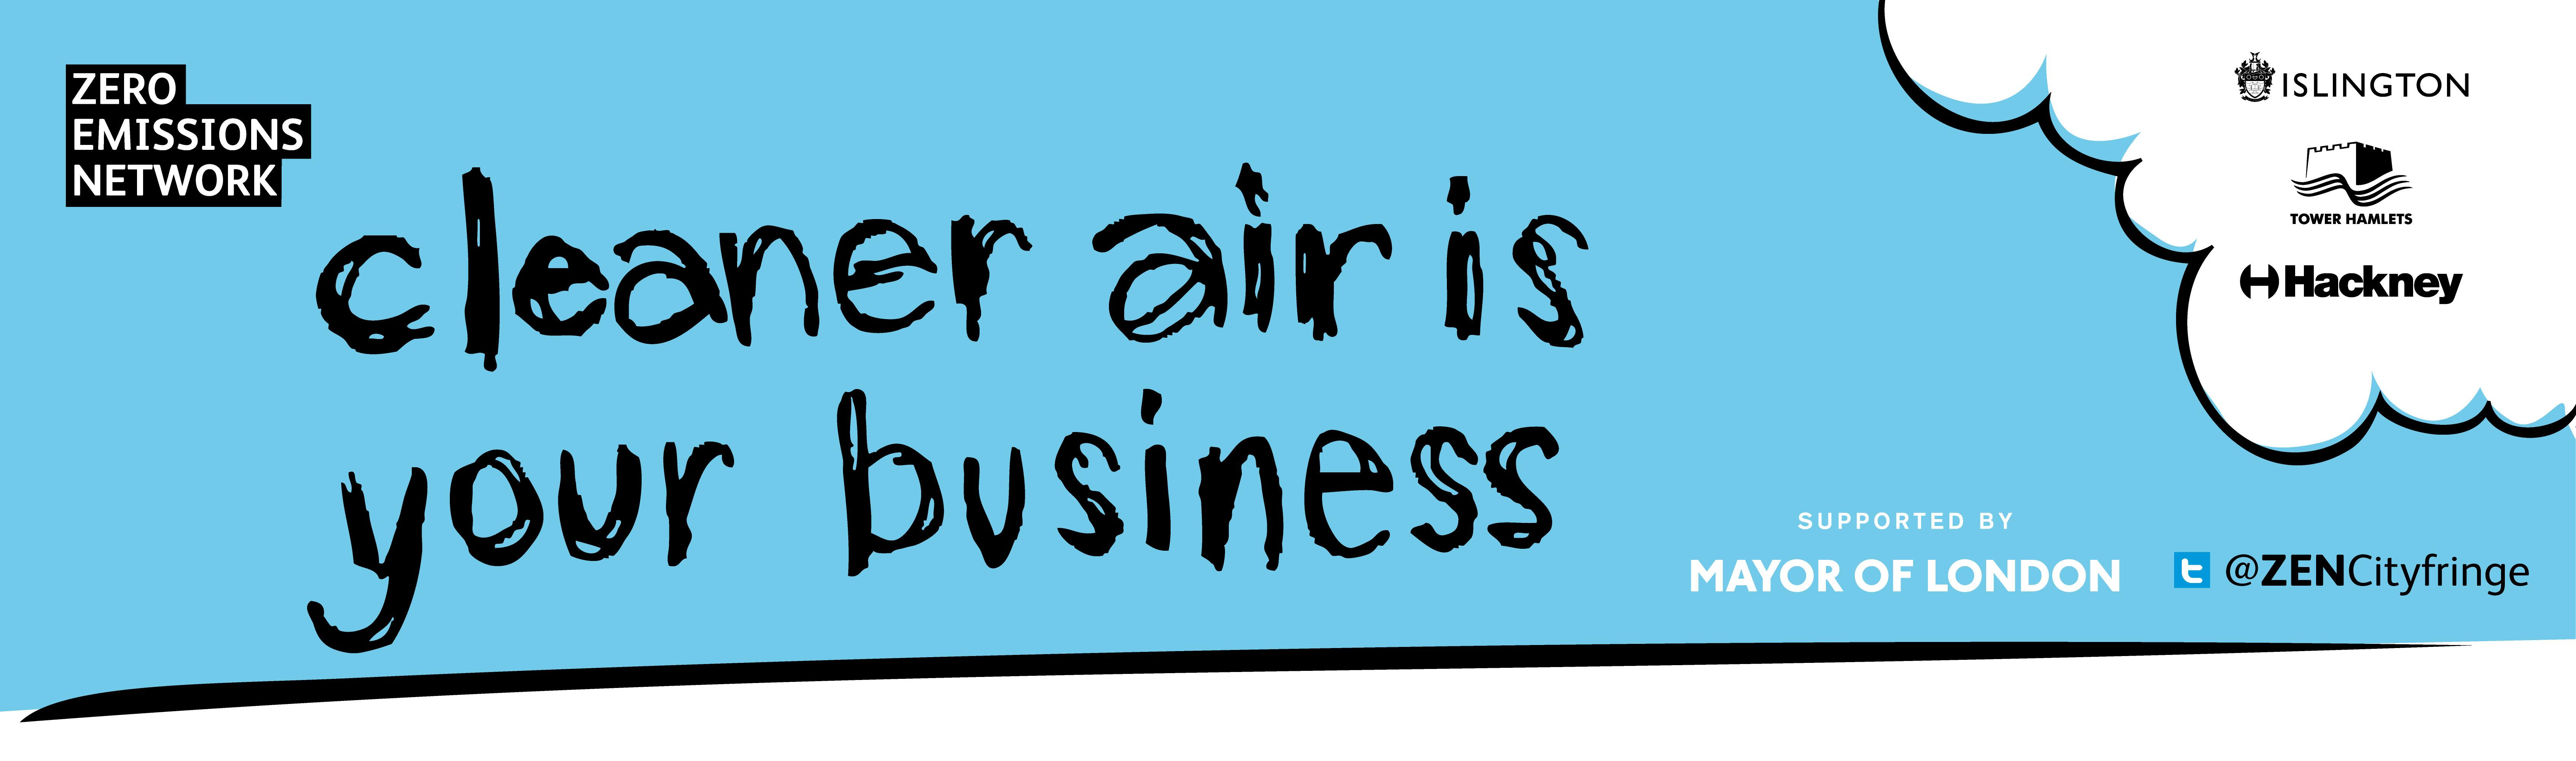 Zero Emissions Network Logo